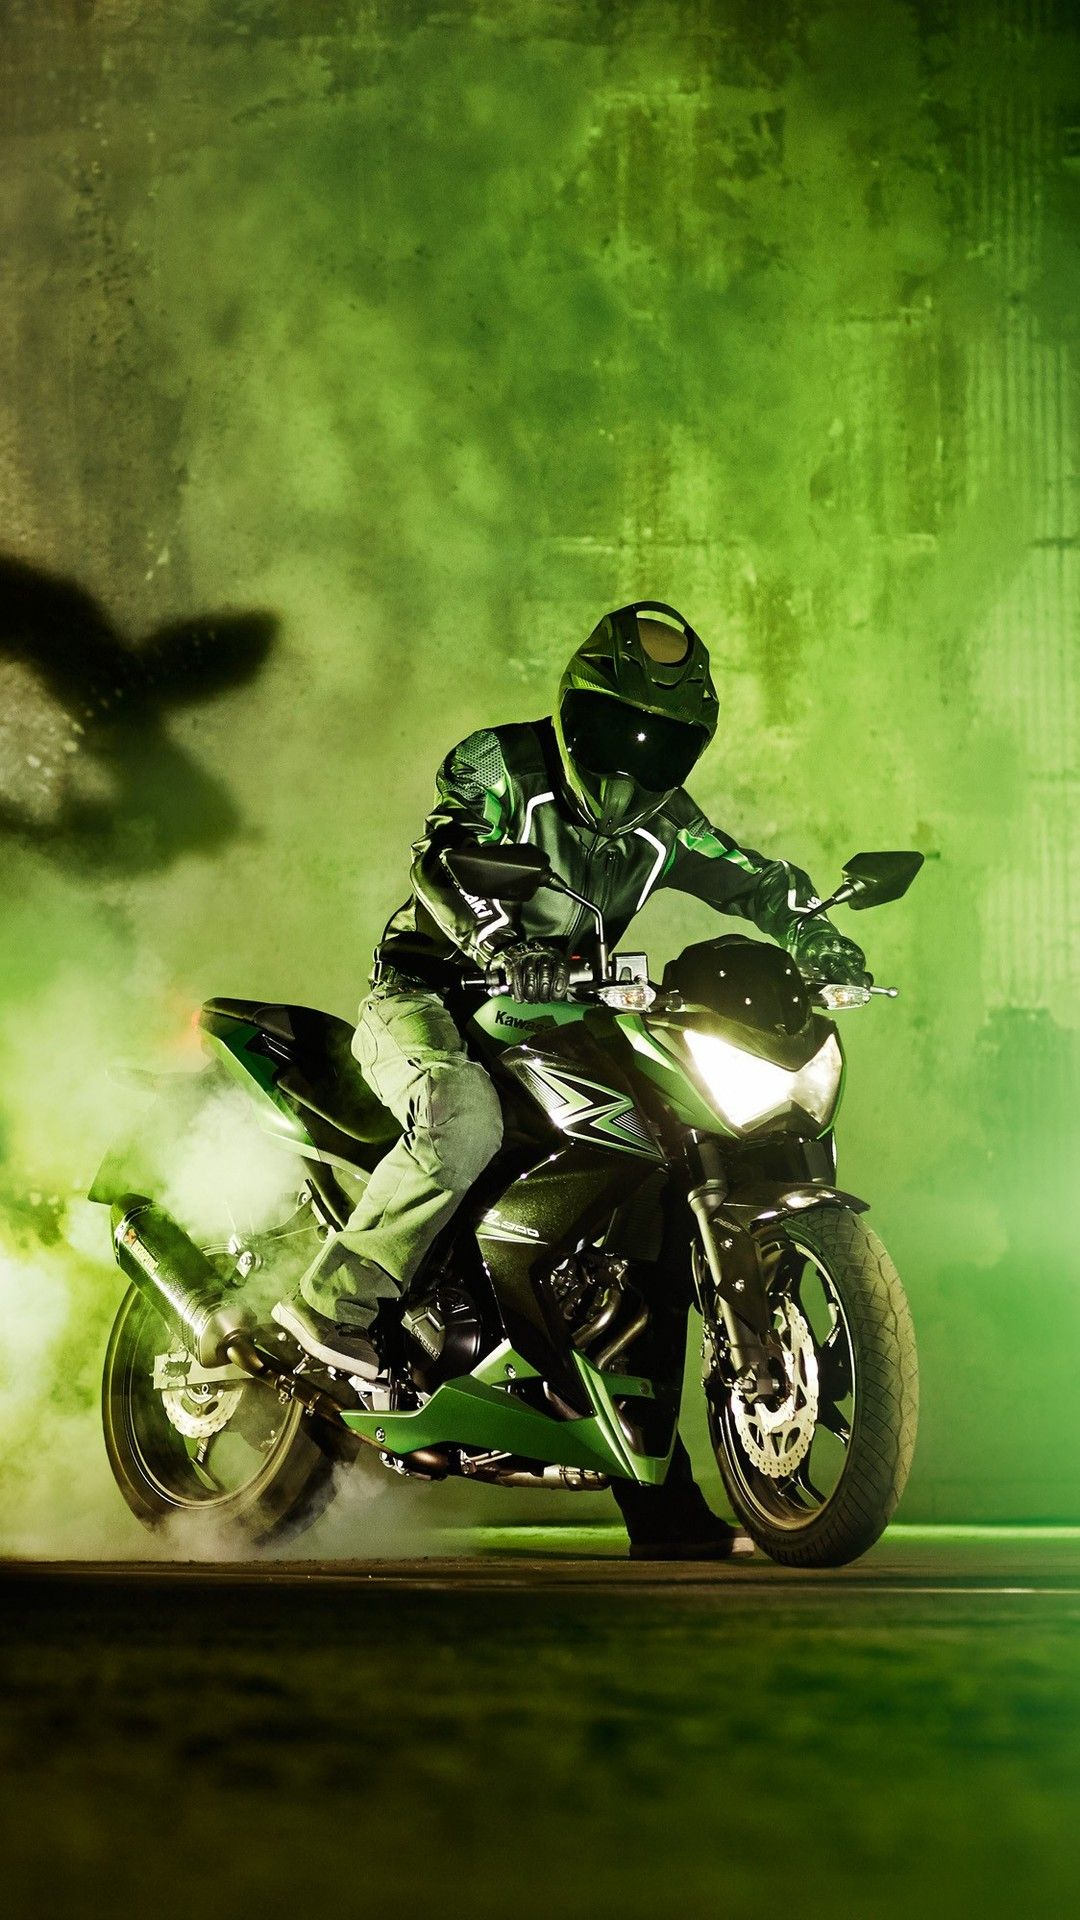 Kawasaki Z300 2018 4k In 1080x1920 Resolution Motorcycle Wallpaper Kawasaki Bike Photoshoot